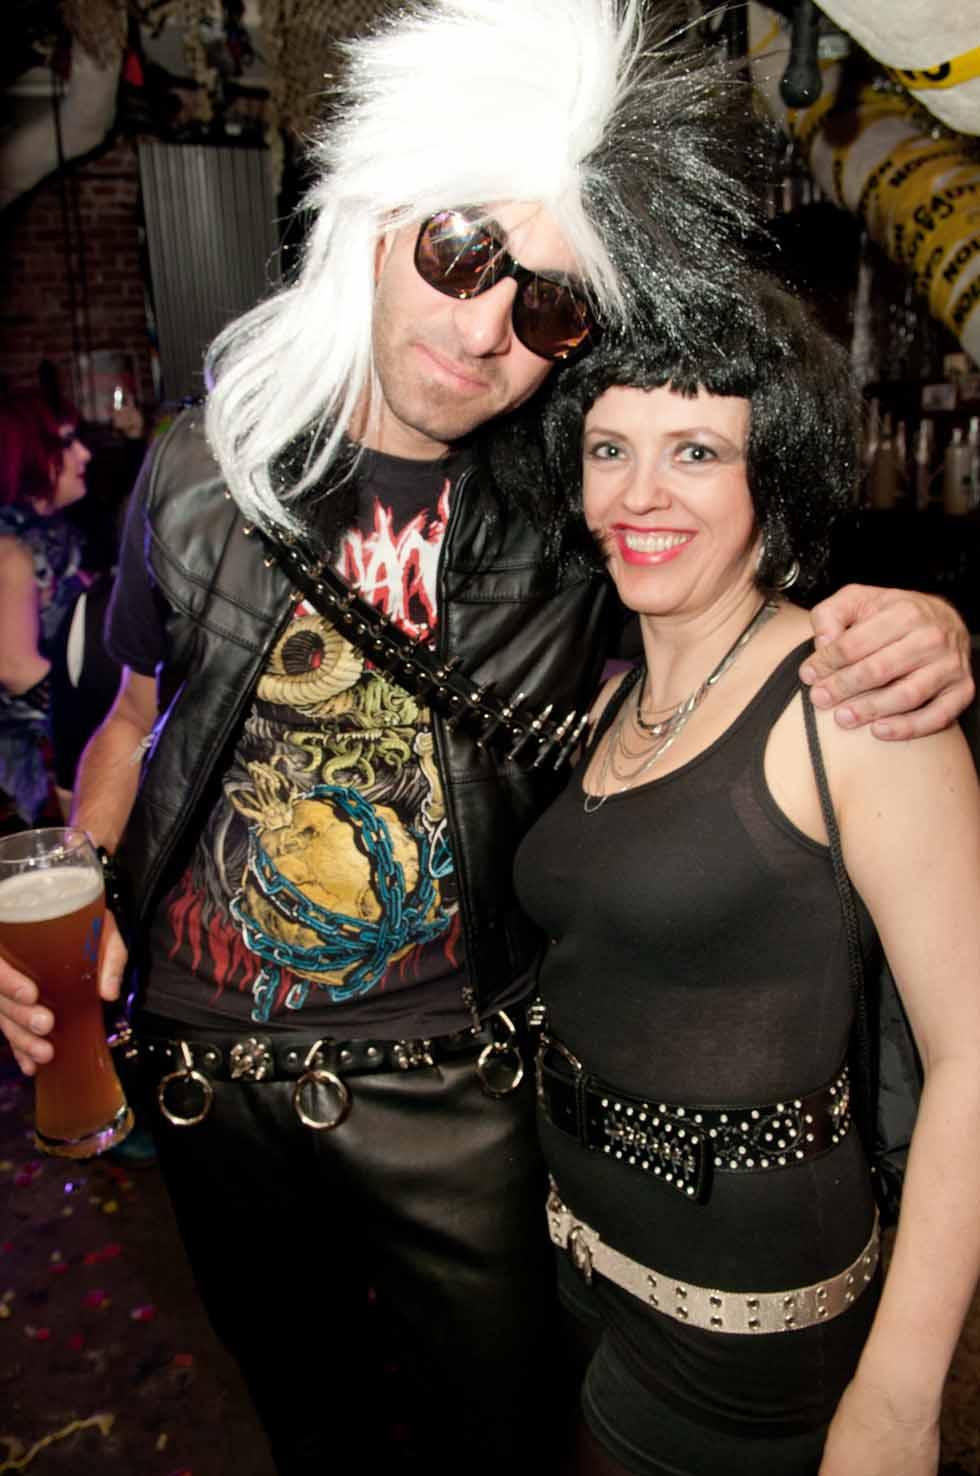 zum-schneider-nyc-2012-karneval-apocalyptika-3915.jpg